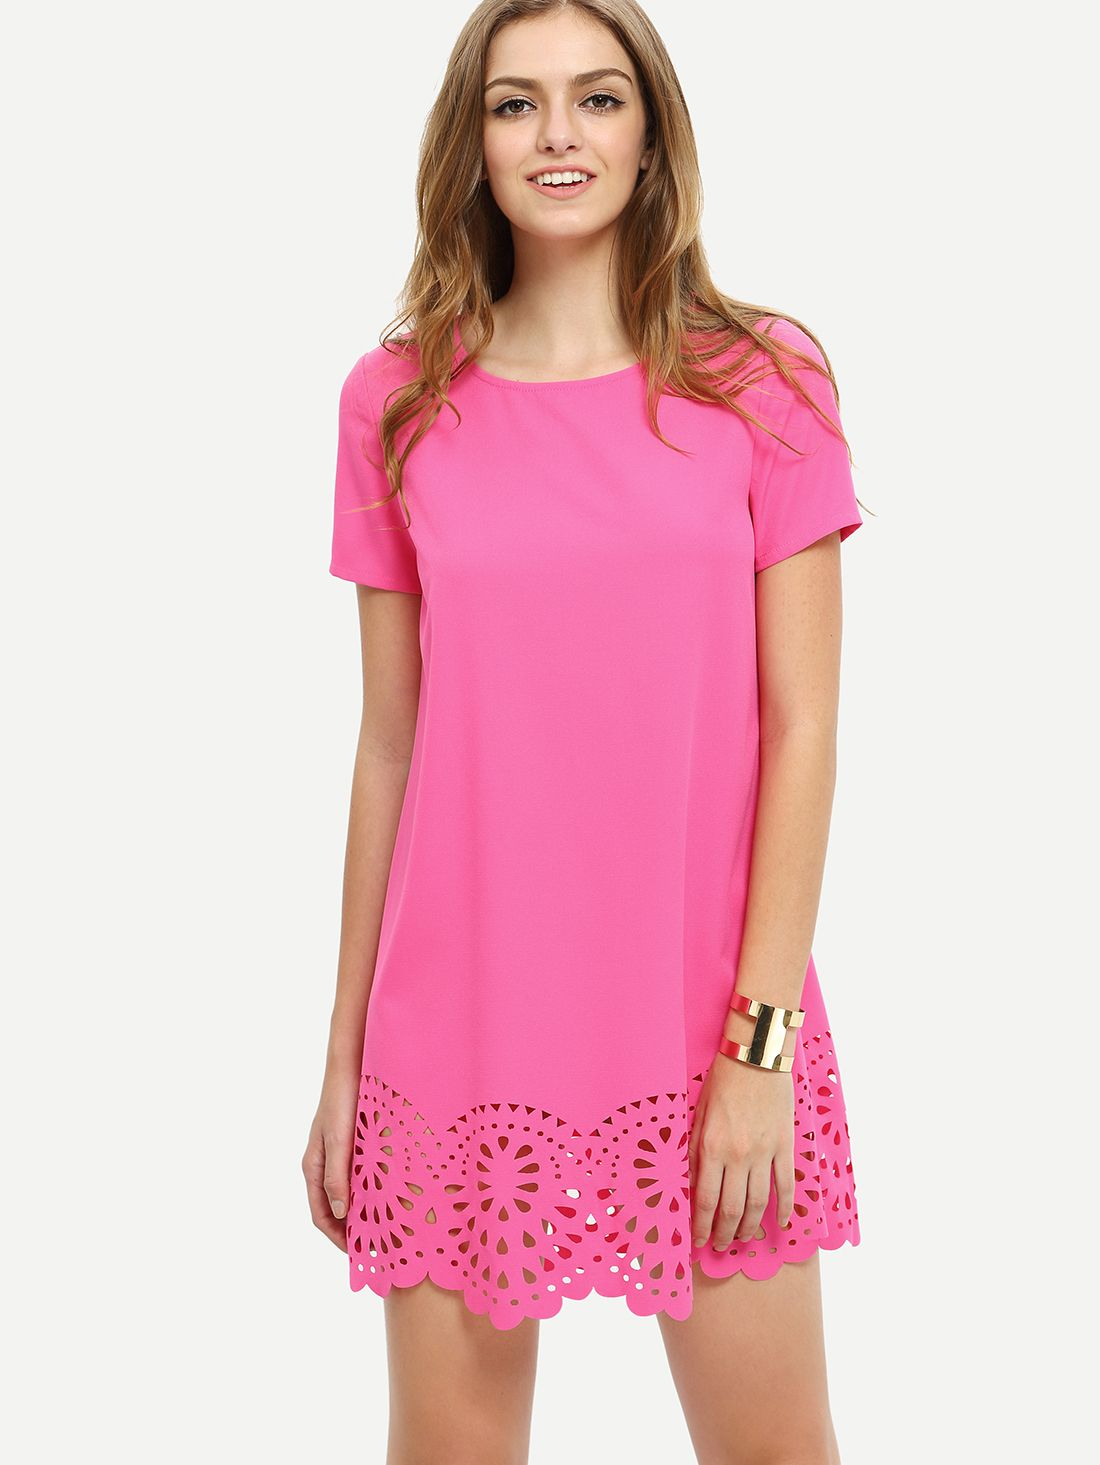 Manga color de rosa caliente hueco corto Vestido suelto -SheIn ...